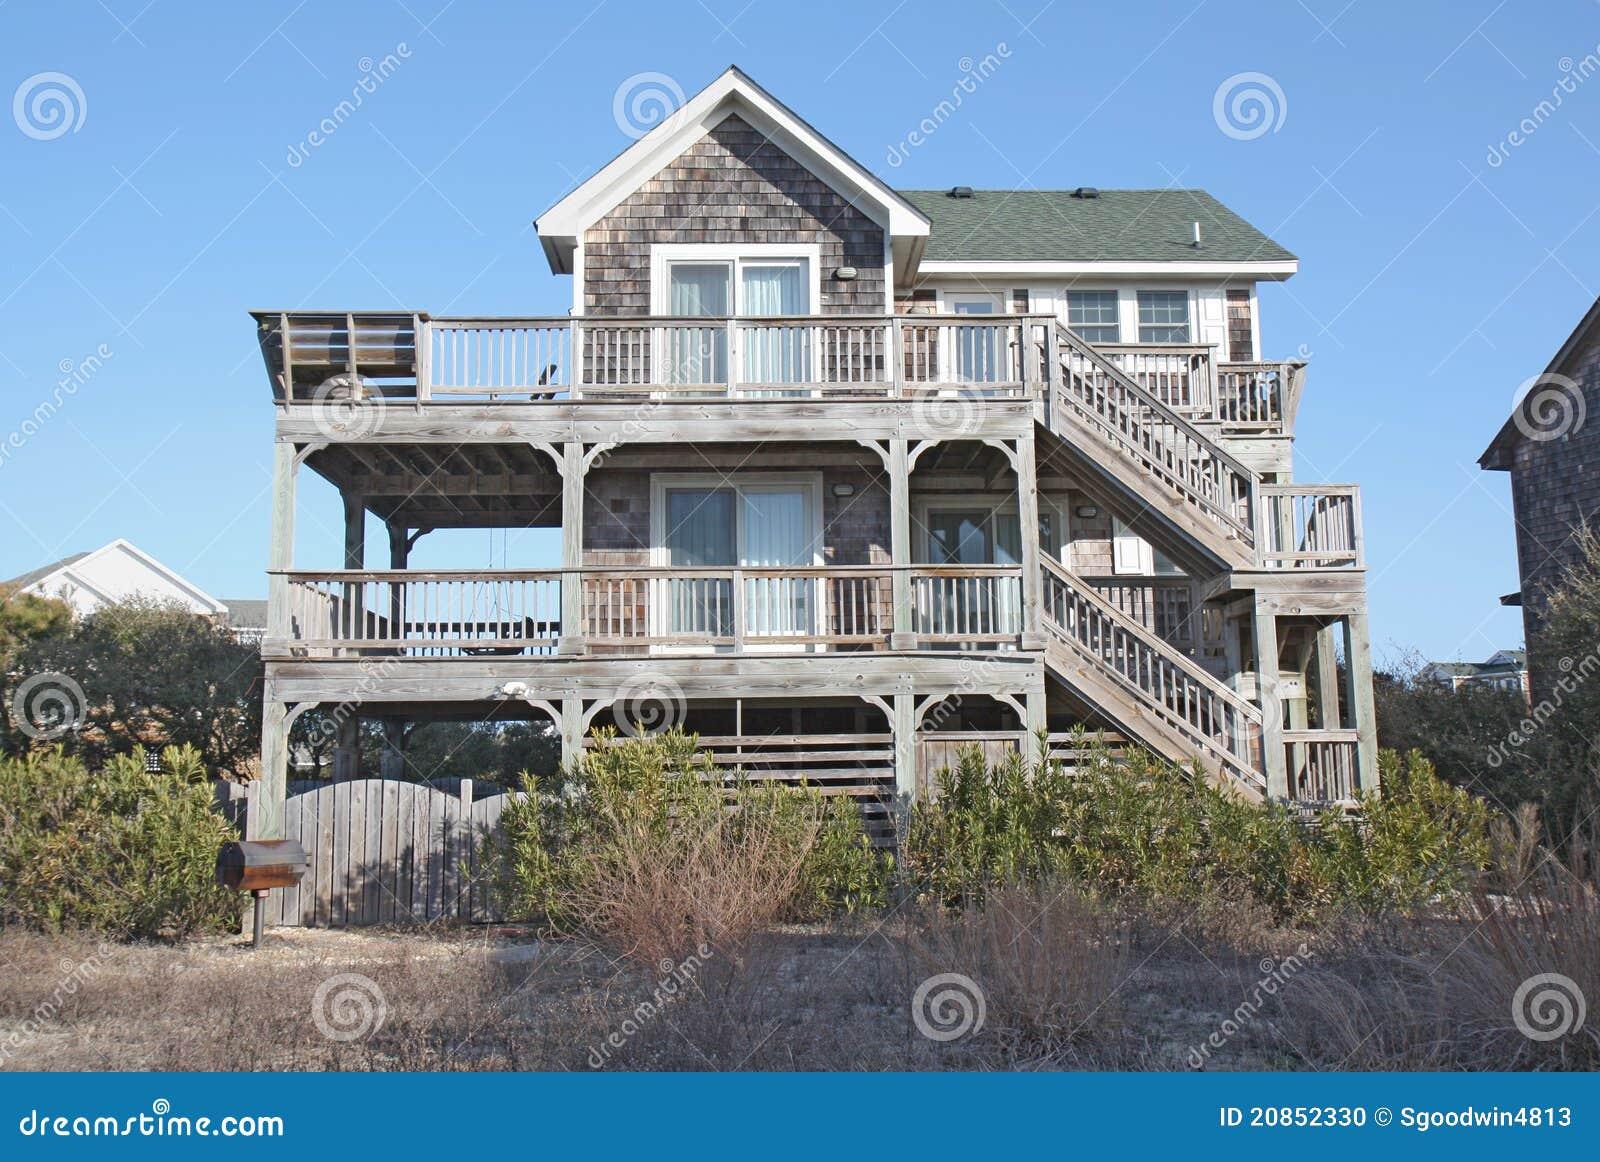 Beach house in north carolina stock photo image 20852330 for Carolina house